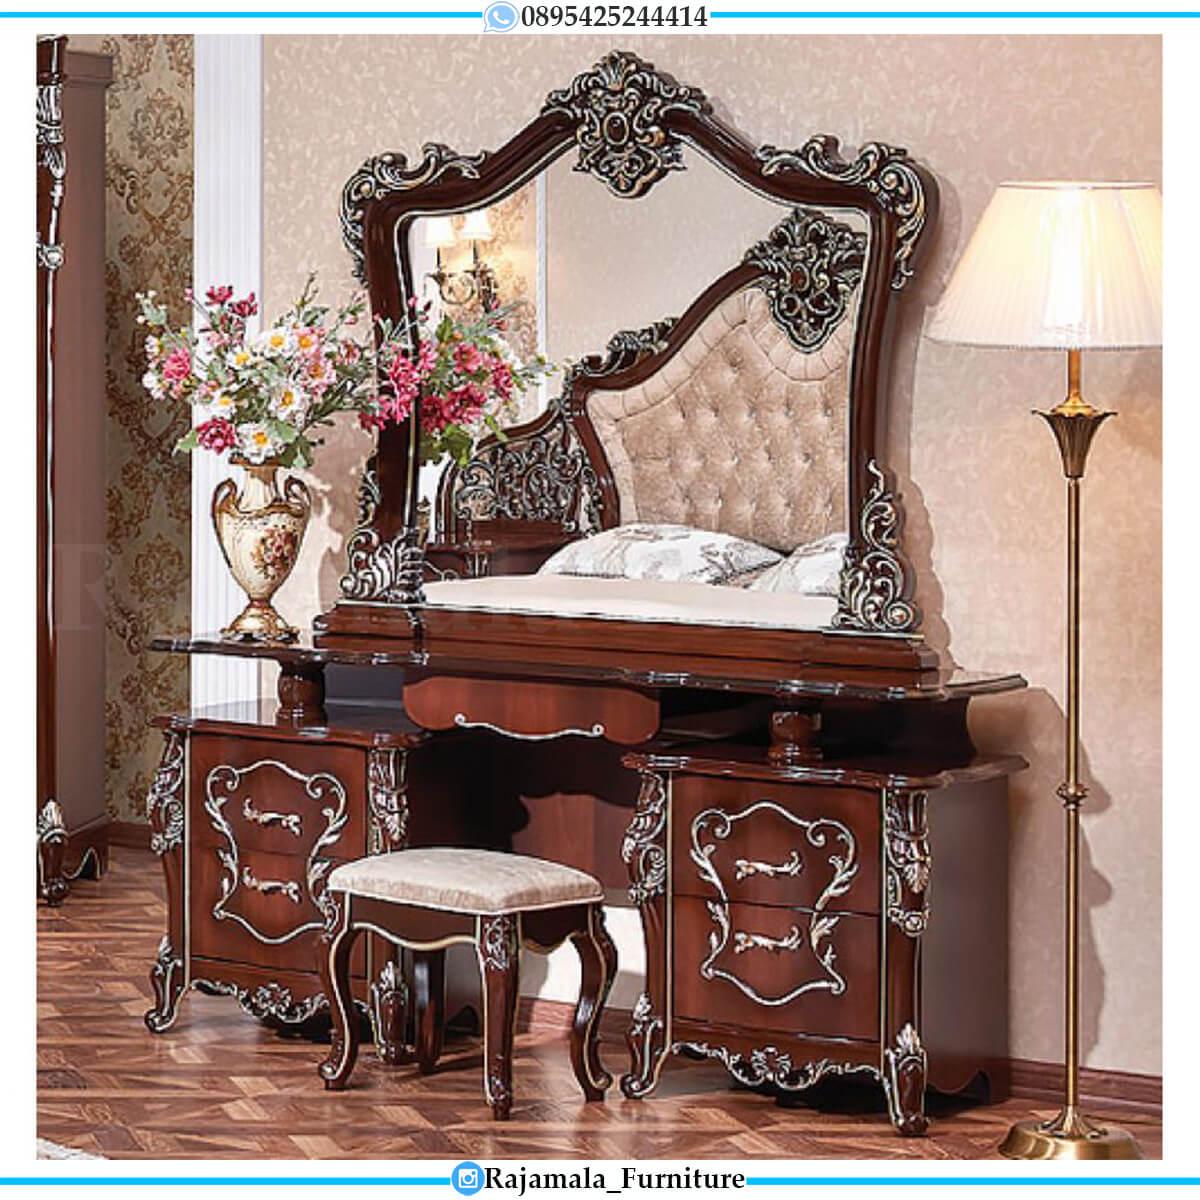 Meja Rias Mewah Jati Natural Marquetry Combination Luxury Design RM-0581